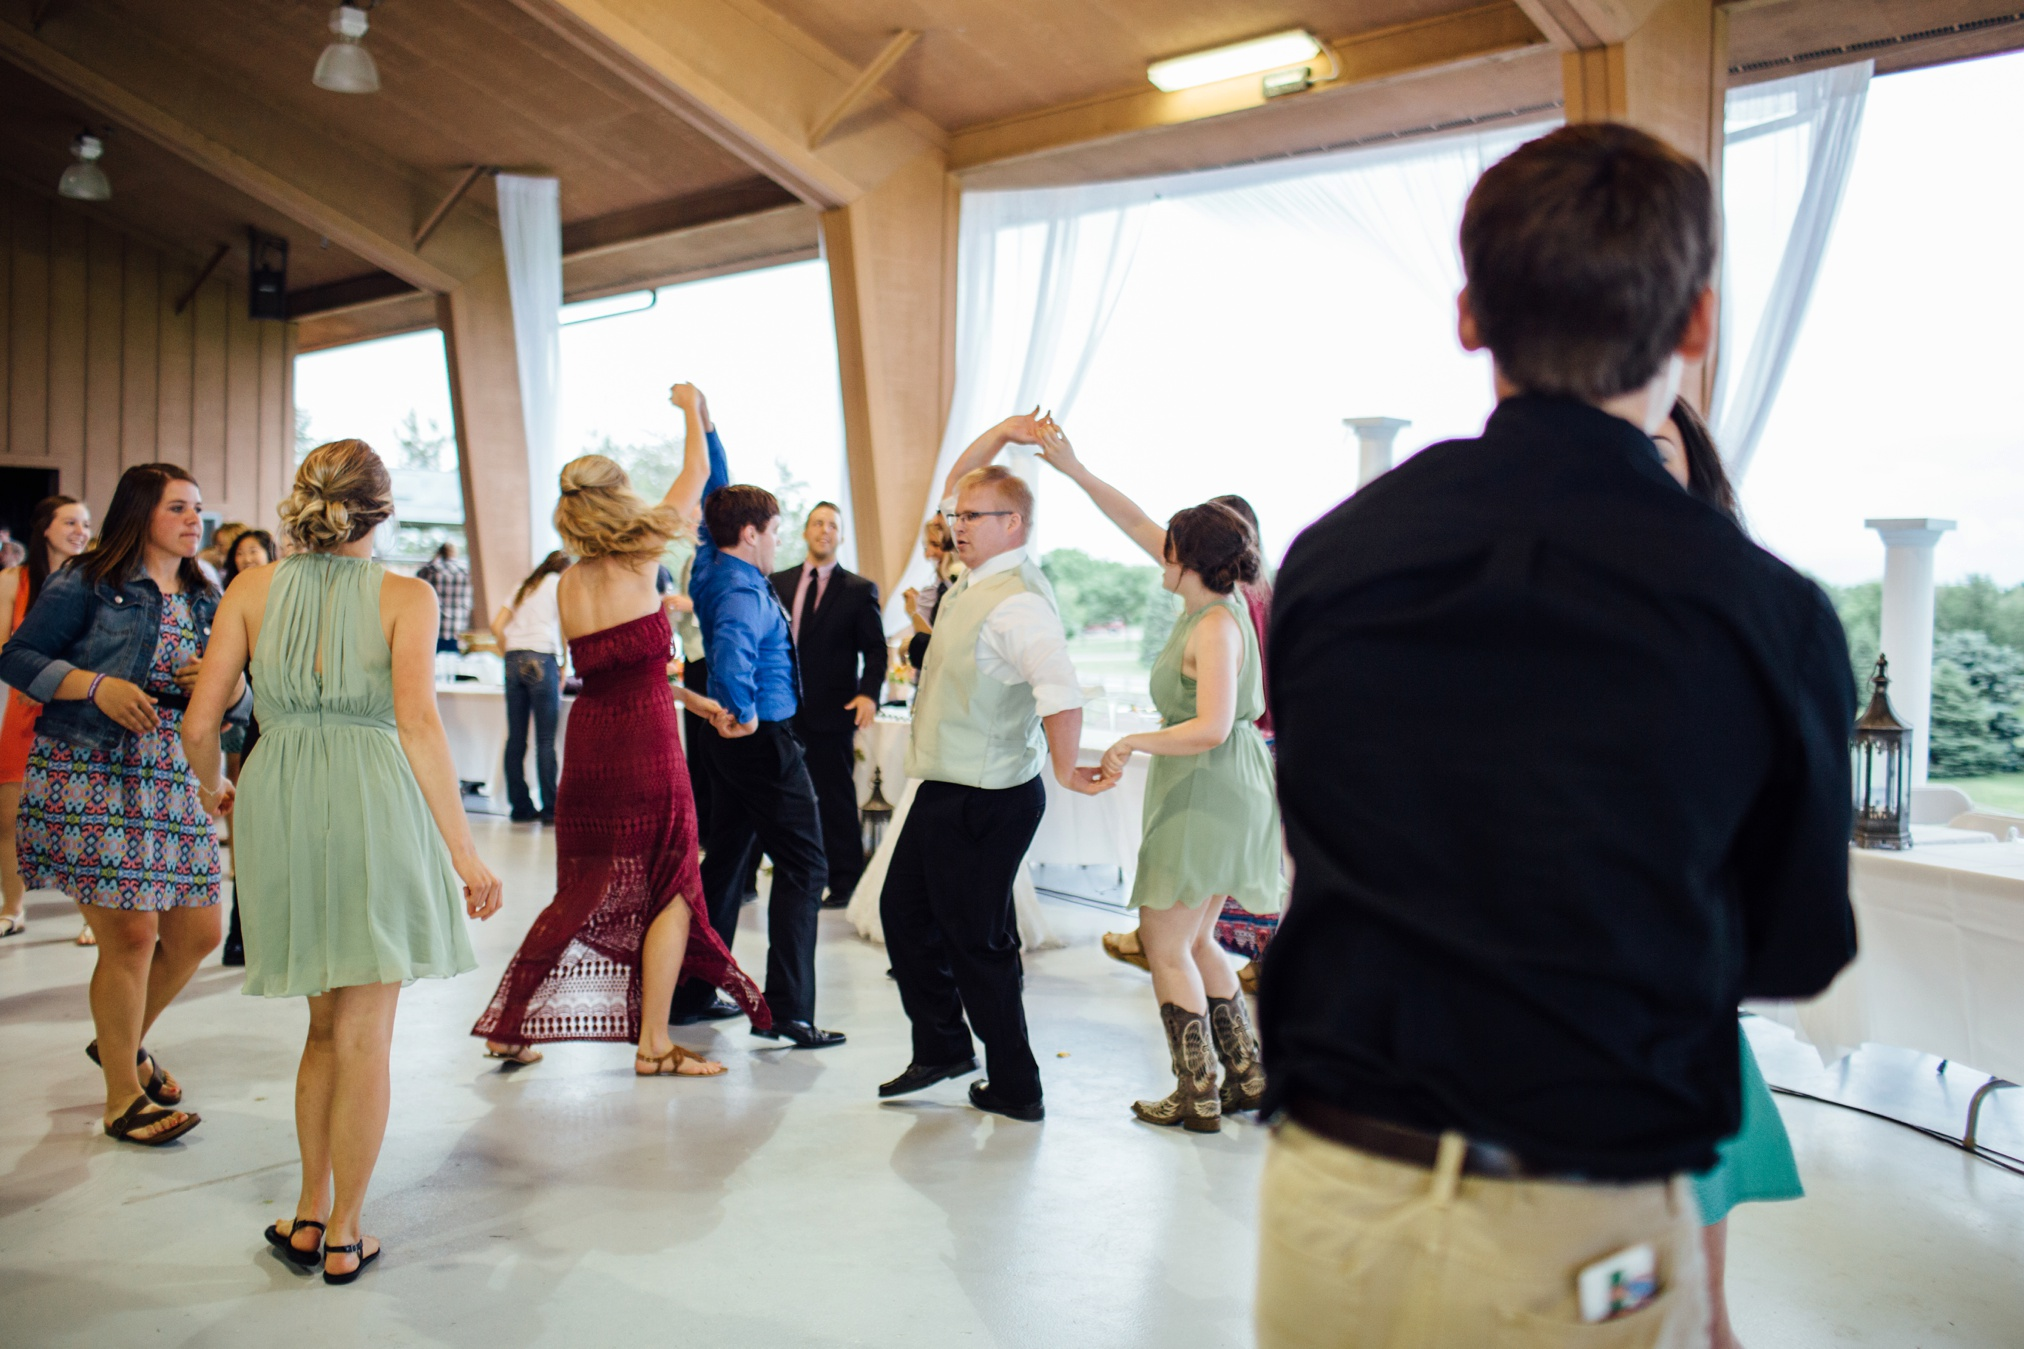 schmid_wedding-901.jpg